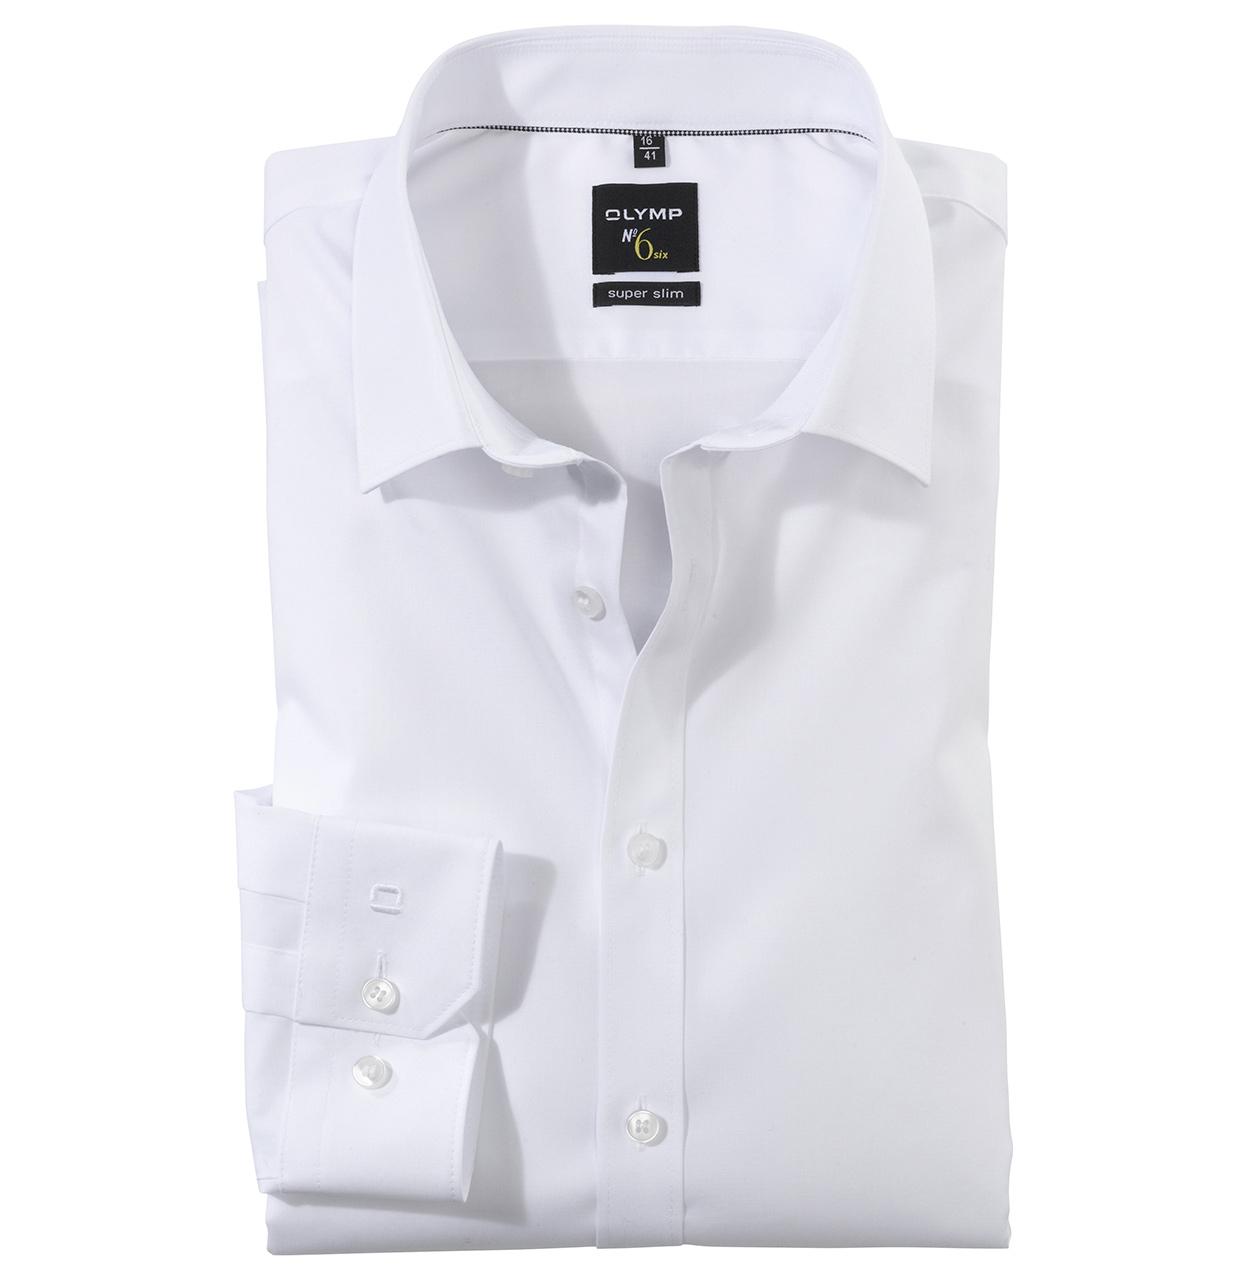 OLYMP Shirt 046664 00 1 046664 wit Maat 38